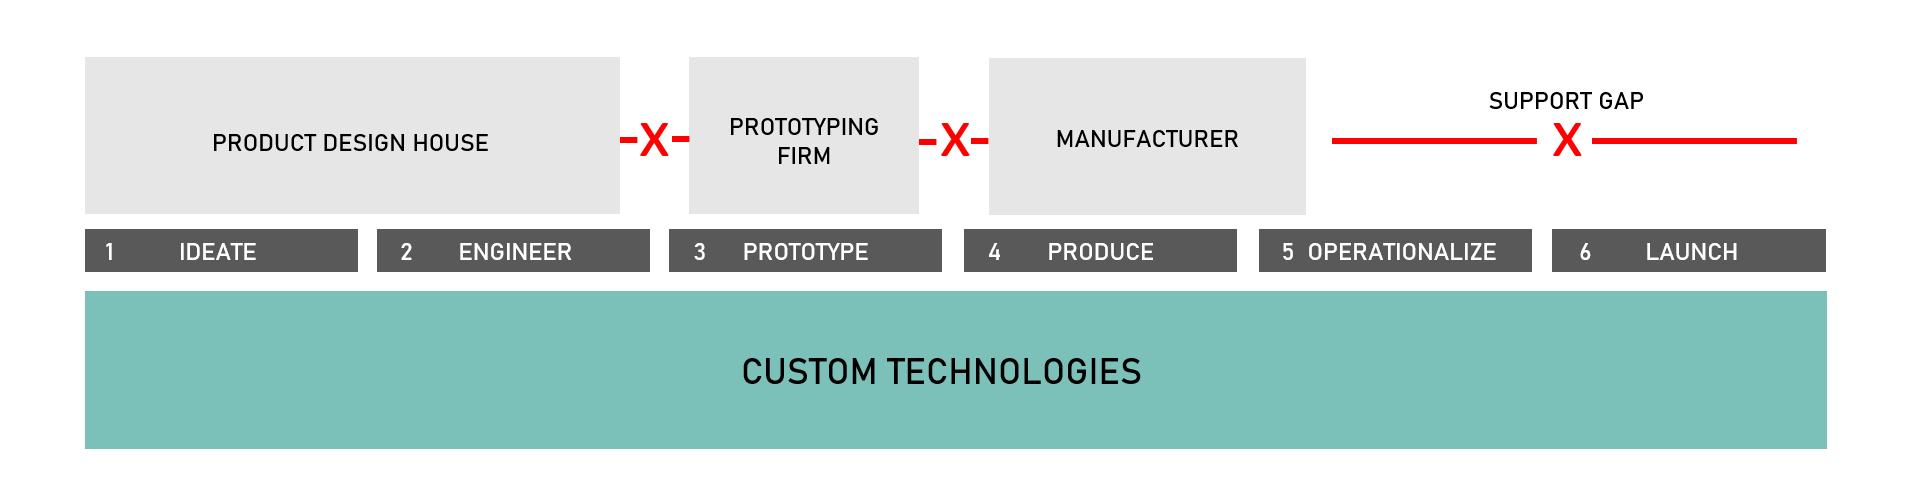 Mvl supply chain